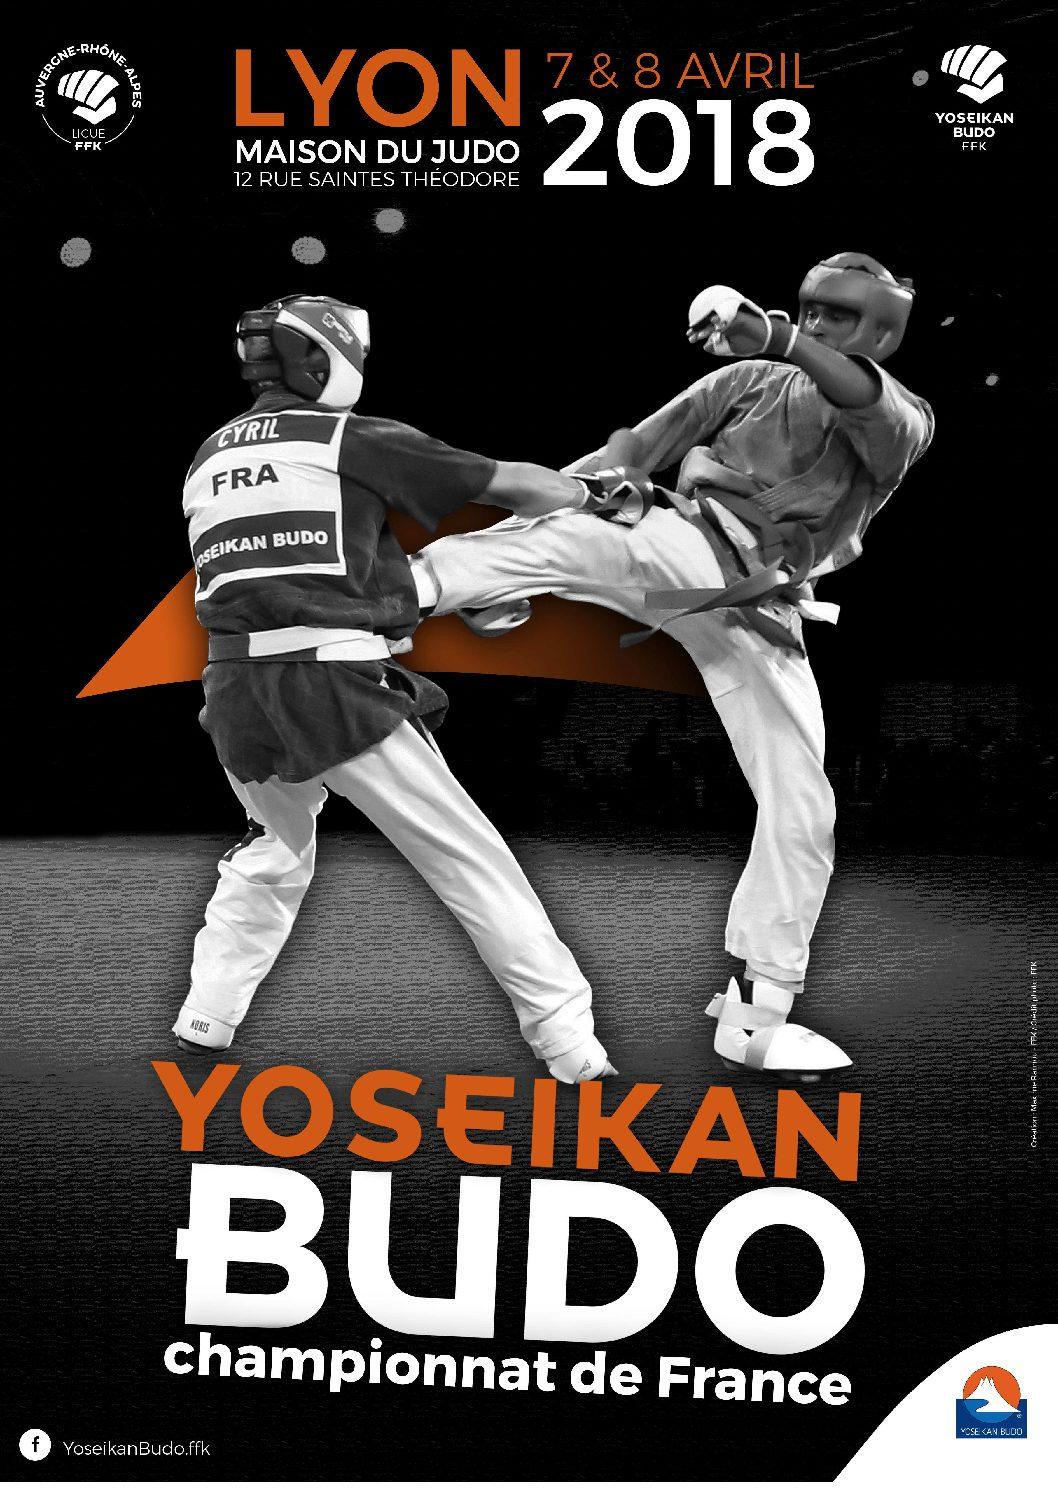 Championnat de France de Yoseikan BUDO